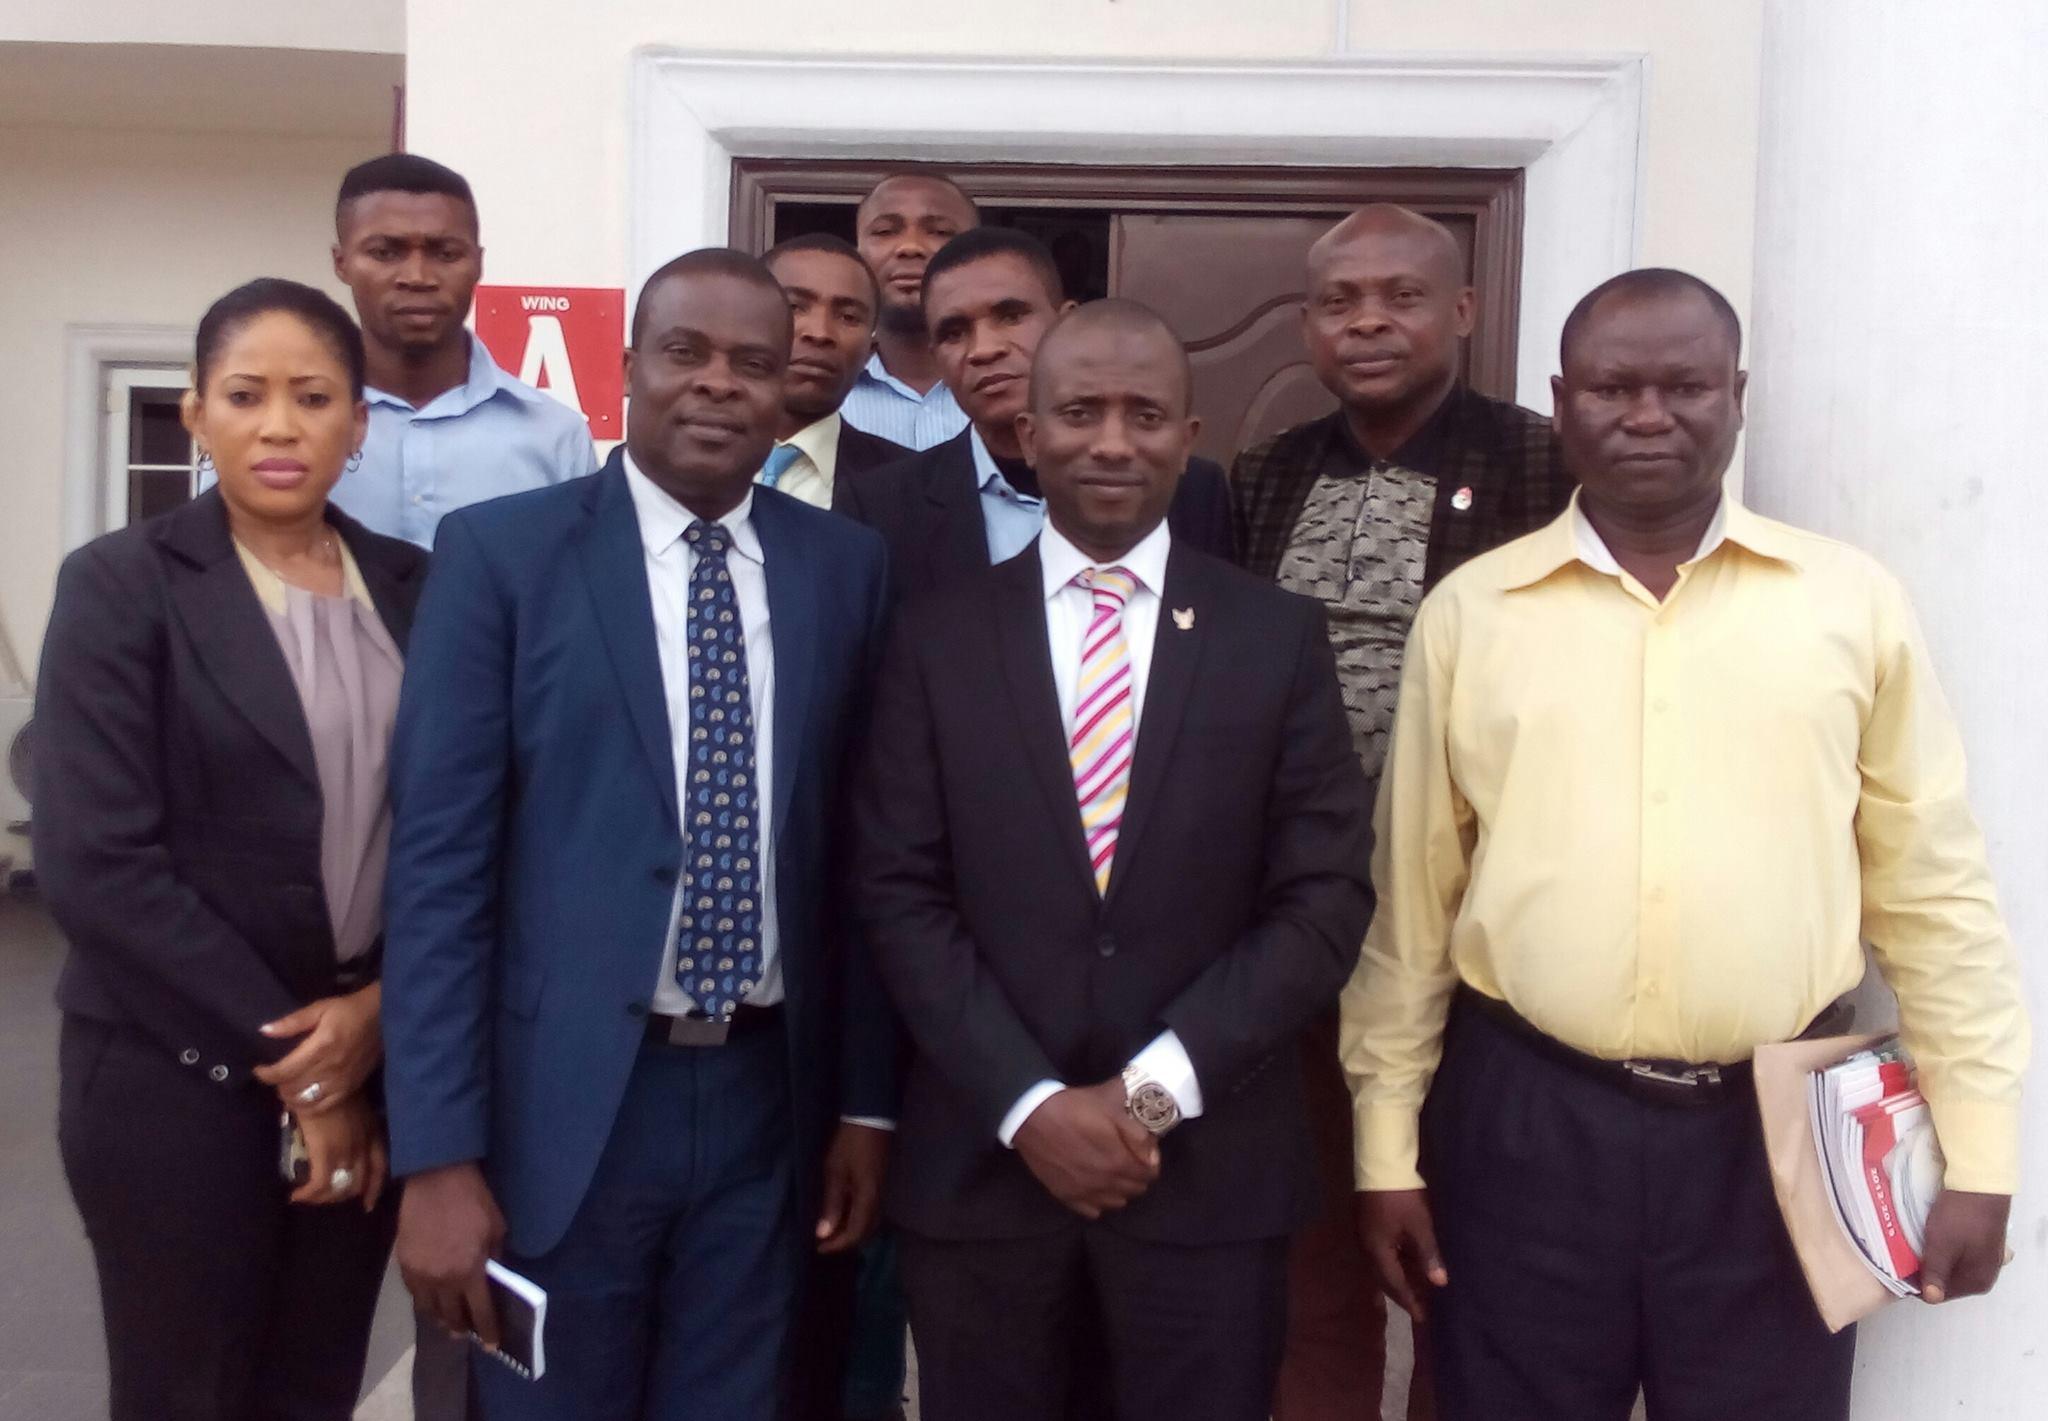 National Anti-Corruption Group Lauds EFCC